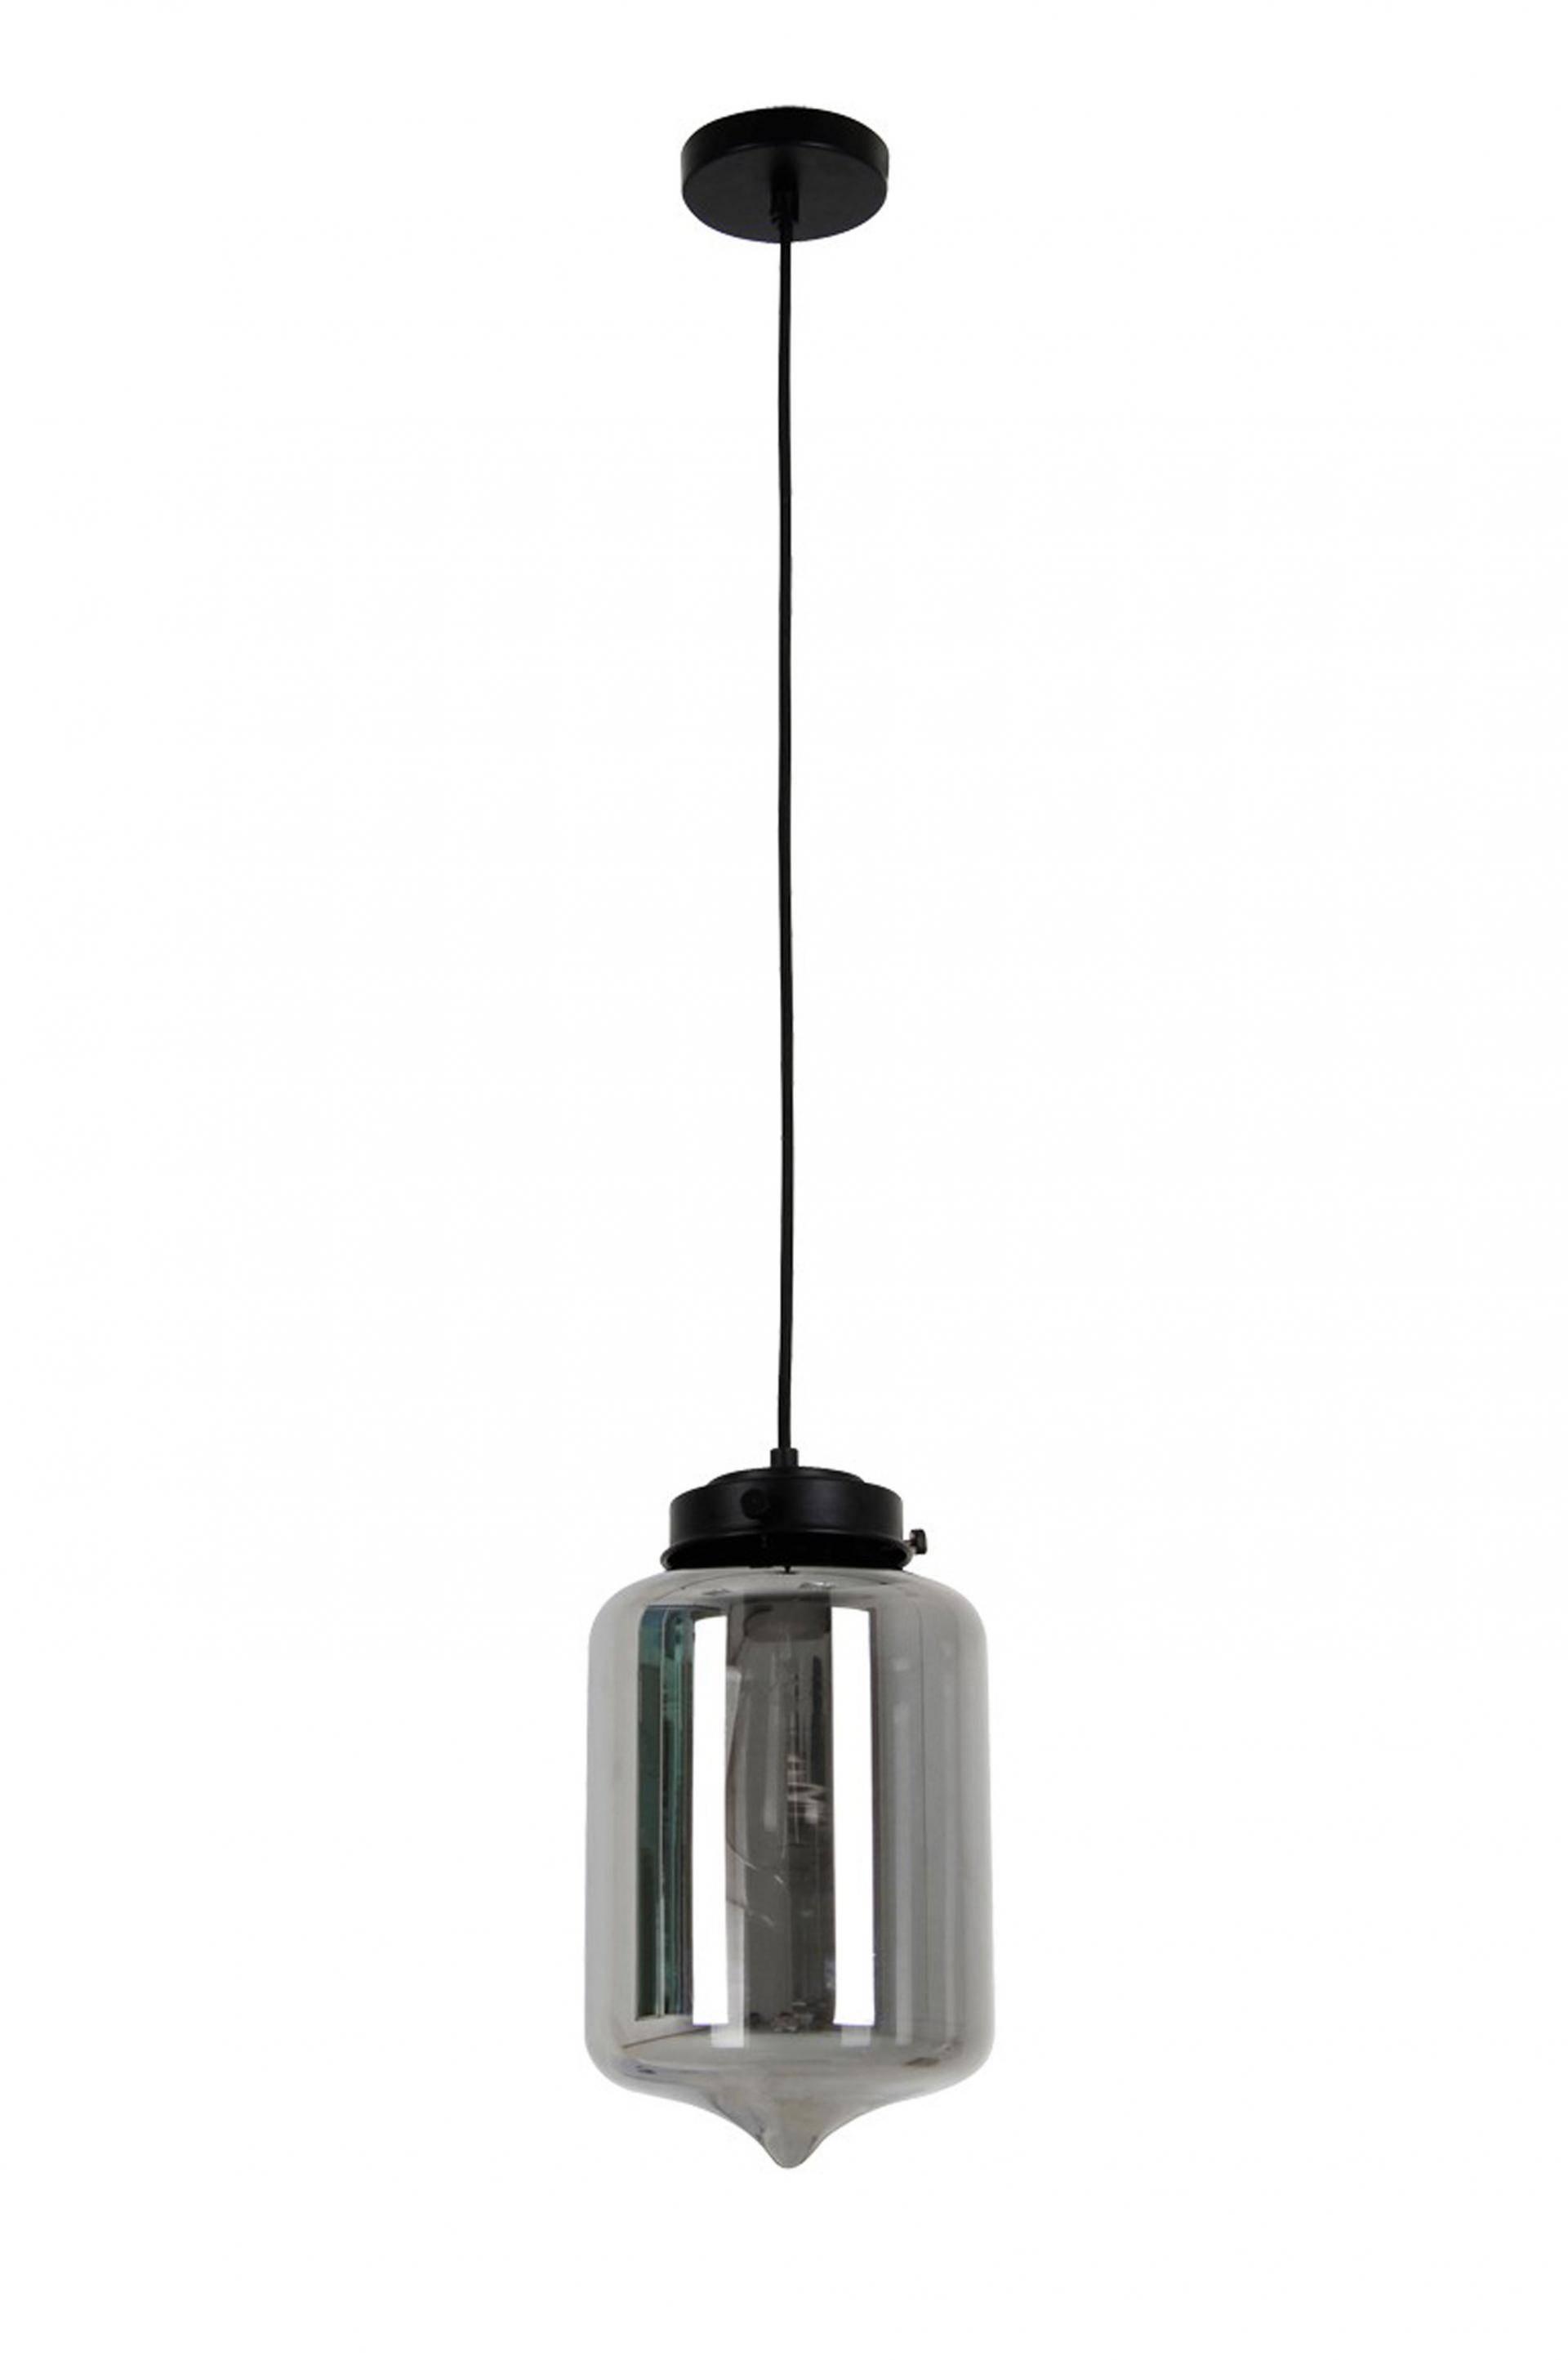 Beacon Pendant Lighting. Beacon Lighting Ledlux Nord Led Up And inside Beacon Pendant Lights (Image 7 of 15)